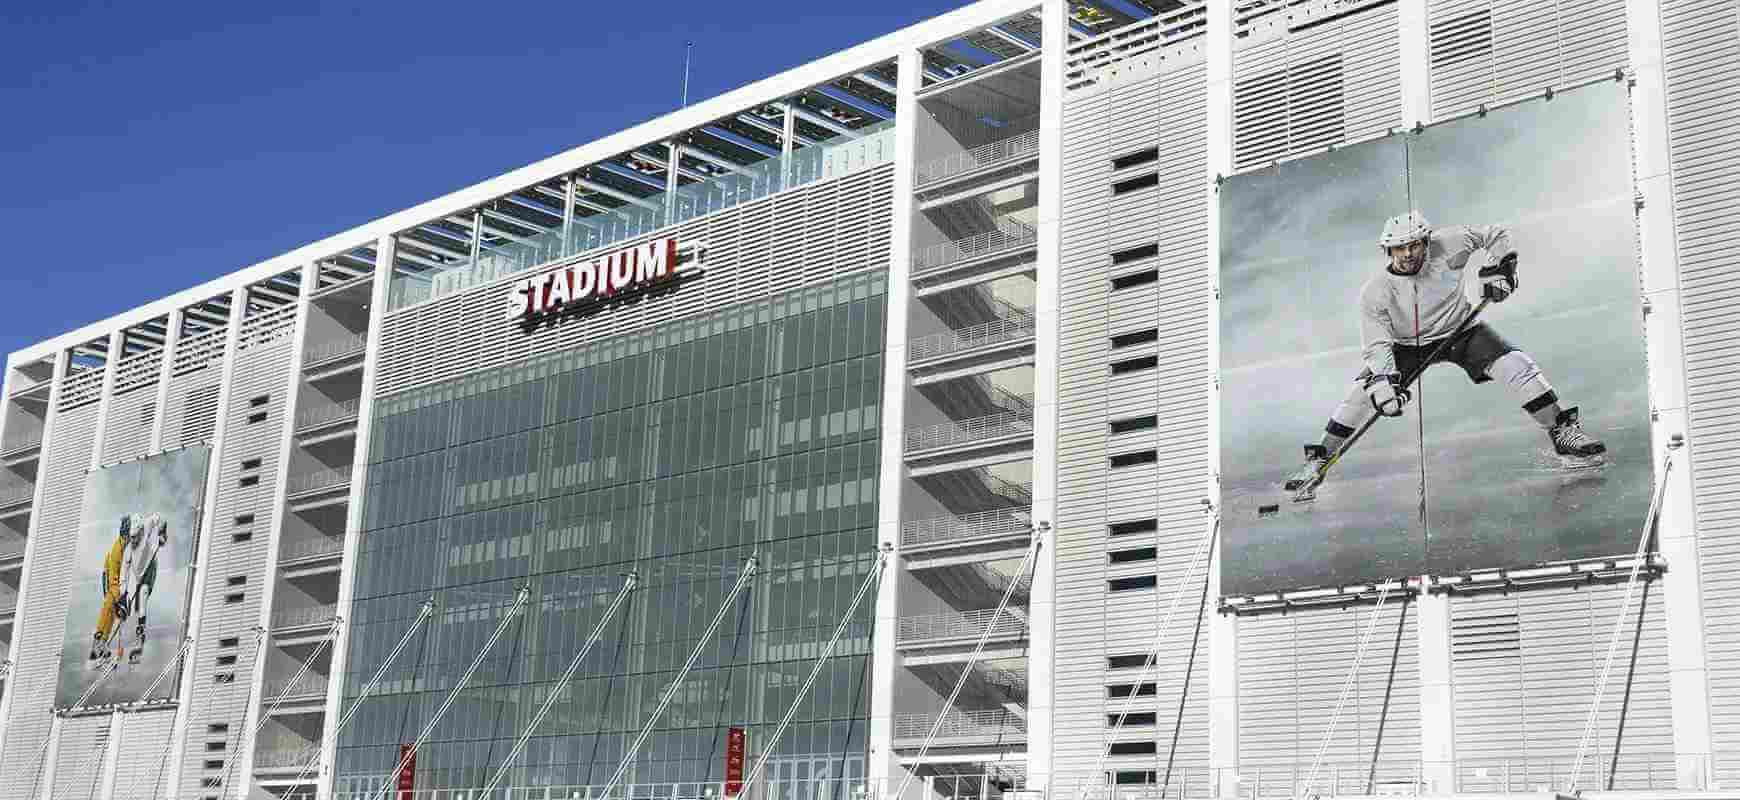 custom stadium signage displayed on the building facade